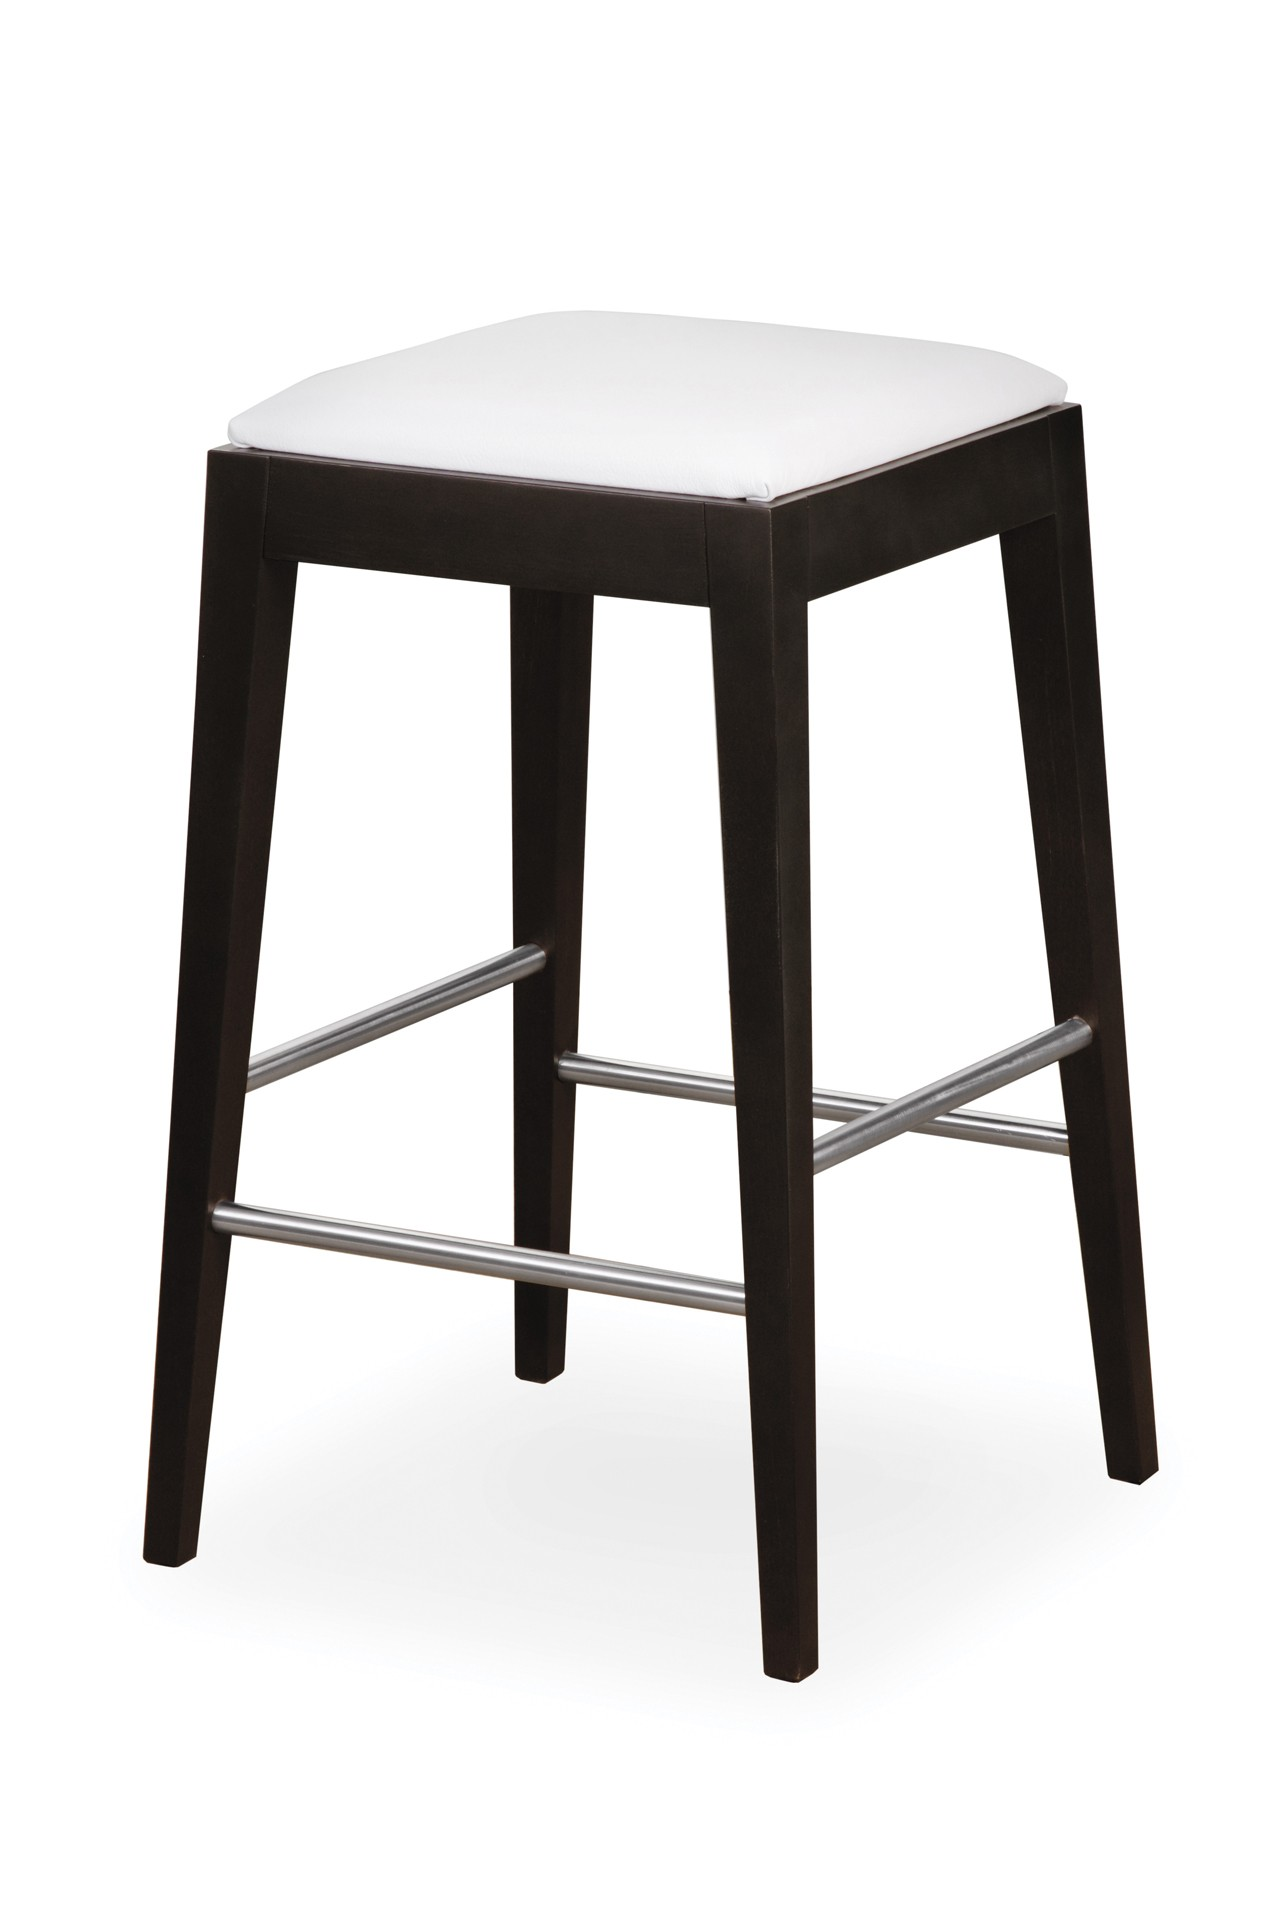 VENGE bar stool with upholstered seat II